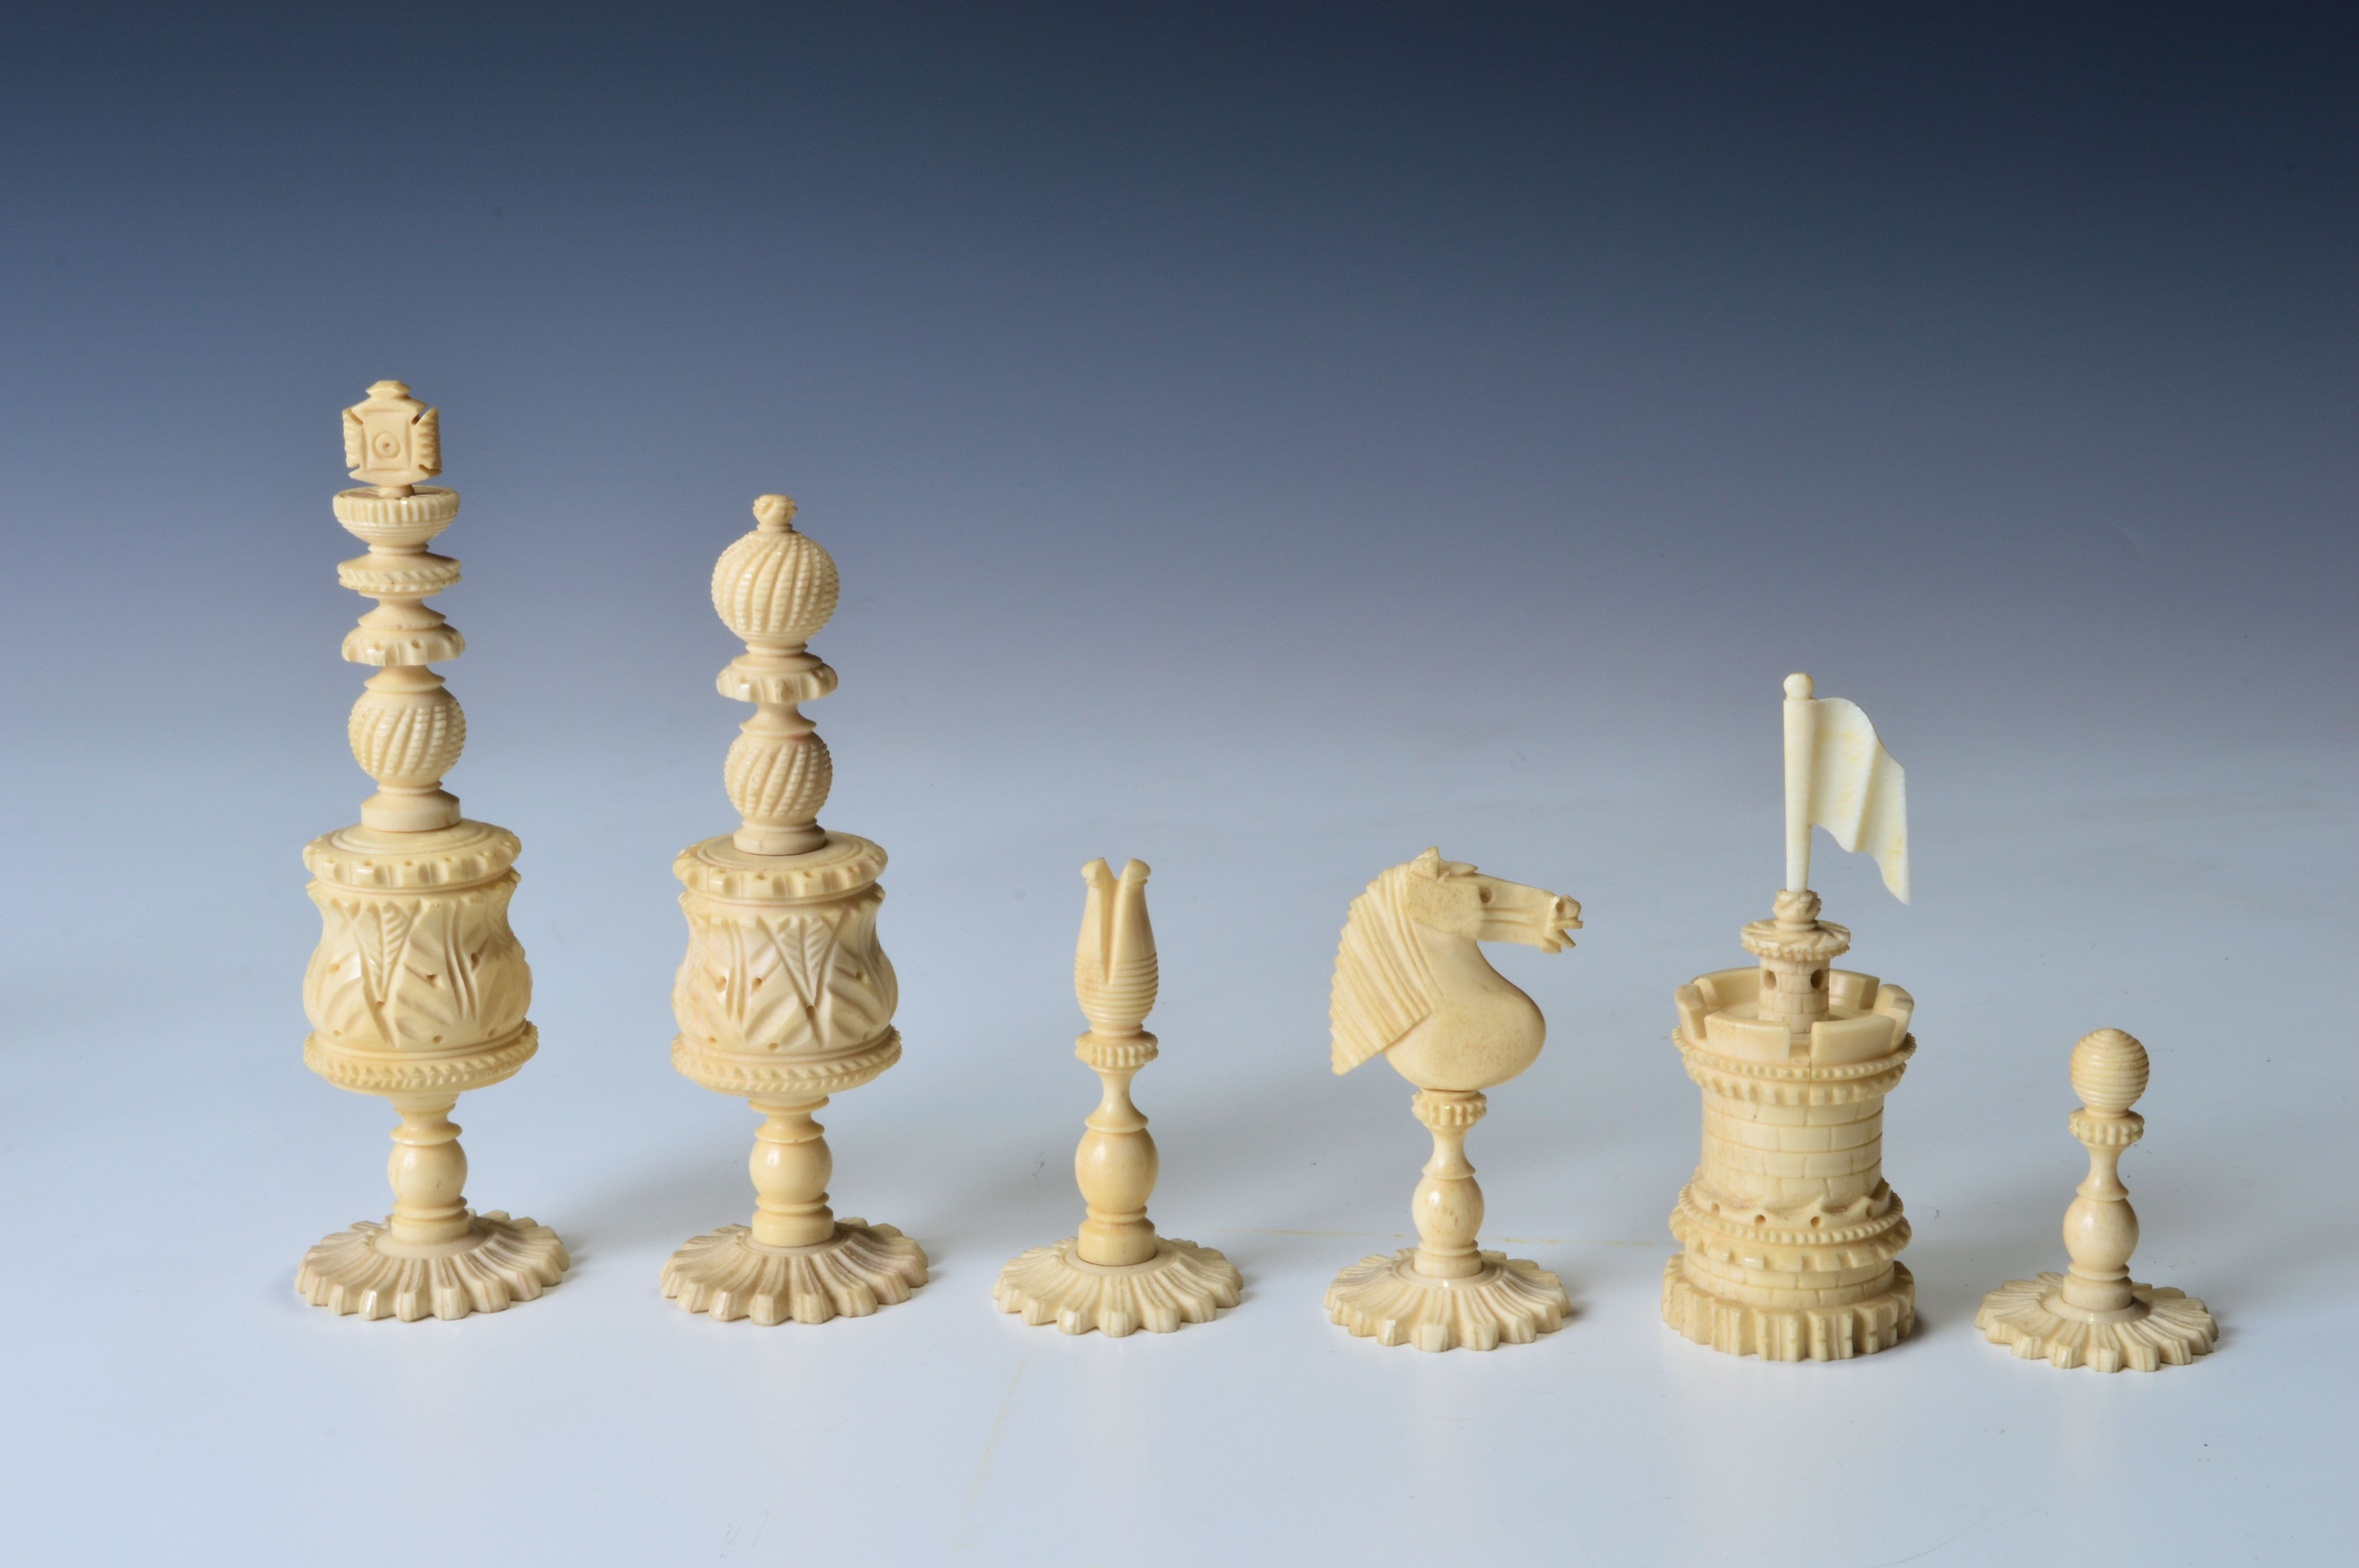 Antique 19th century bone barleycorn chess set - Collectible chess sets ...